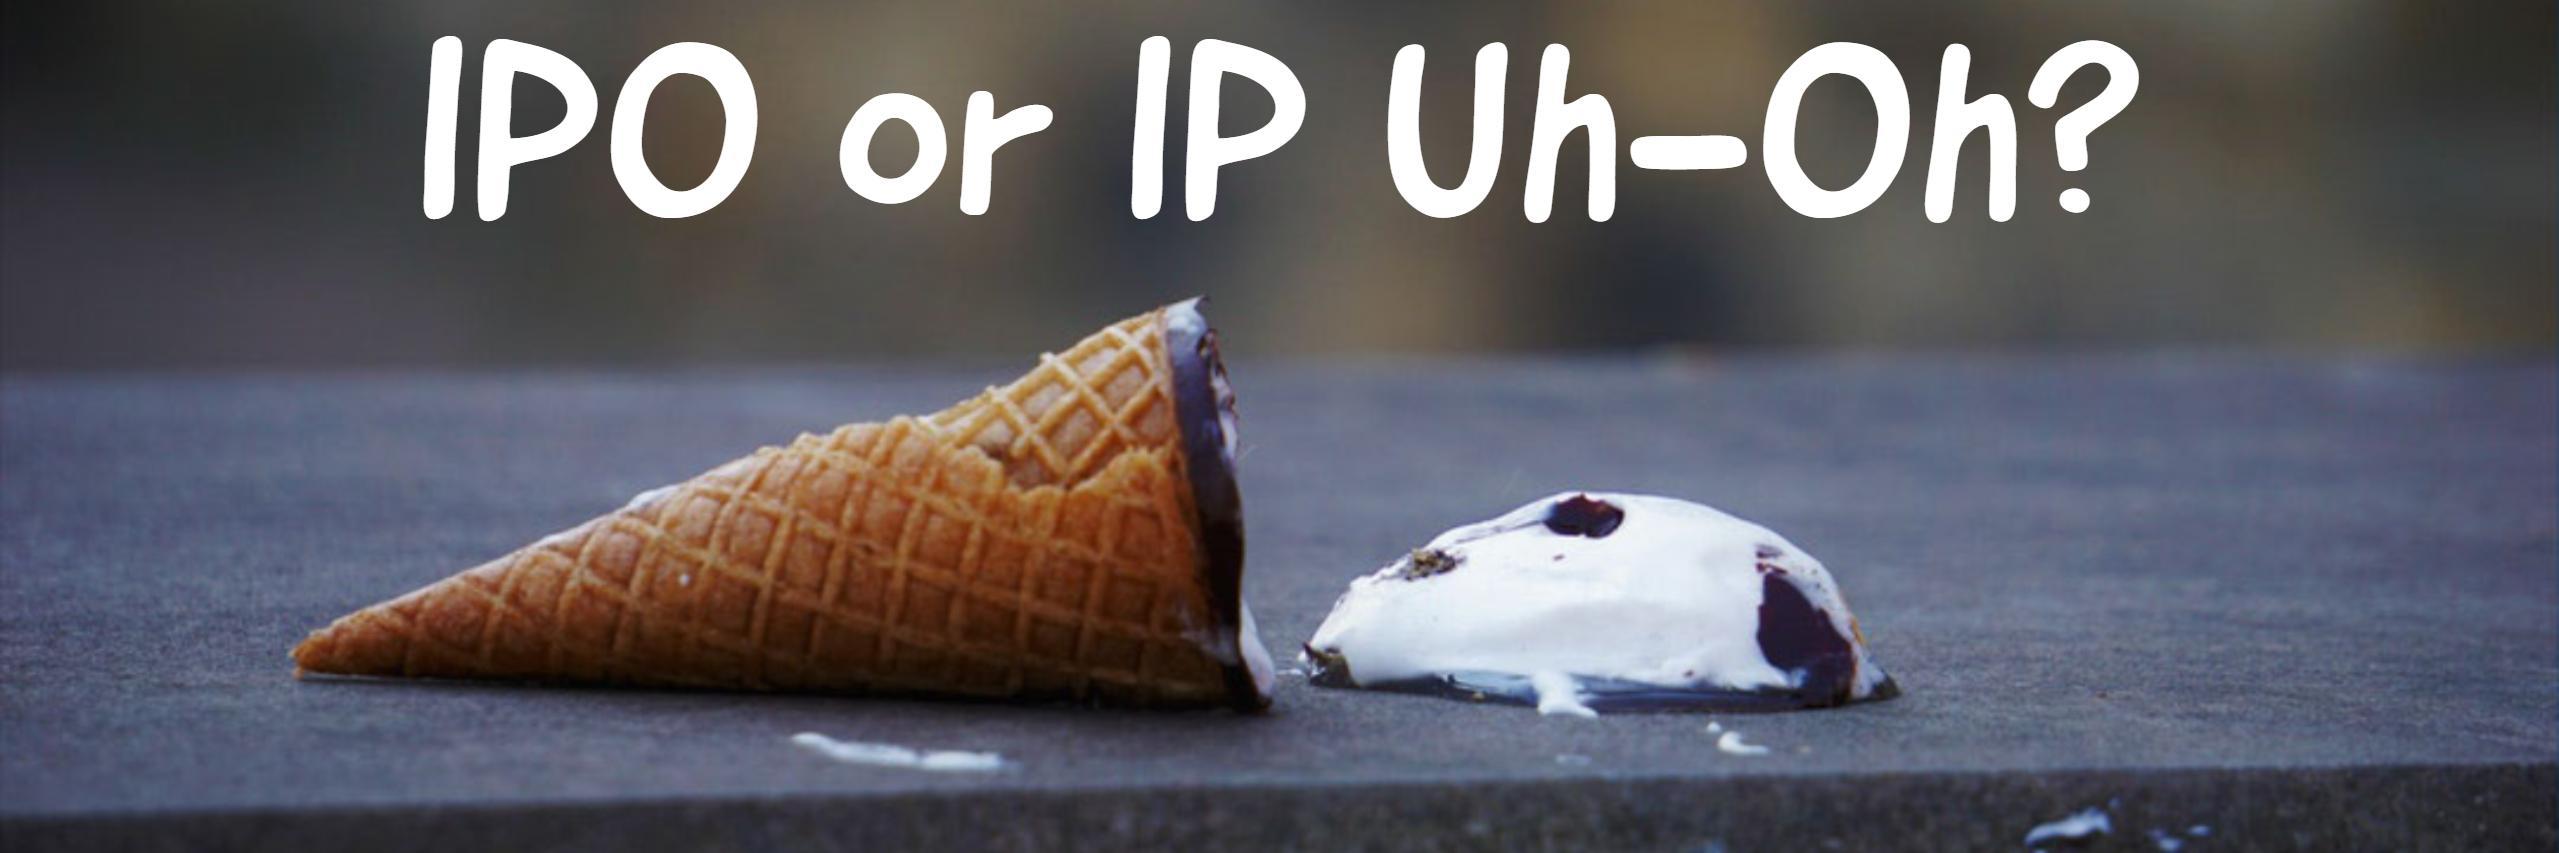 IPO or IP Uh-Oh? Thumbnail